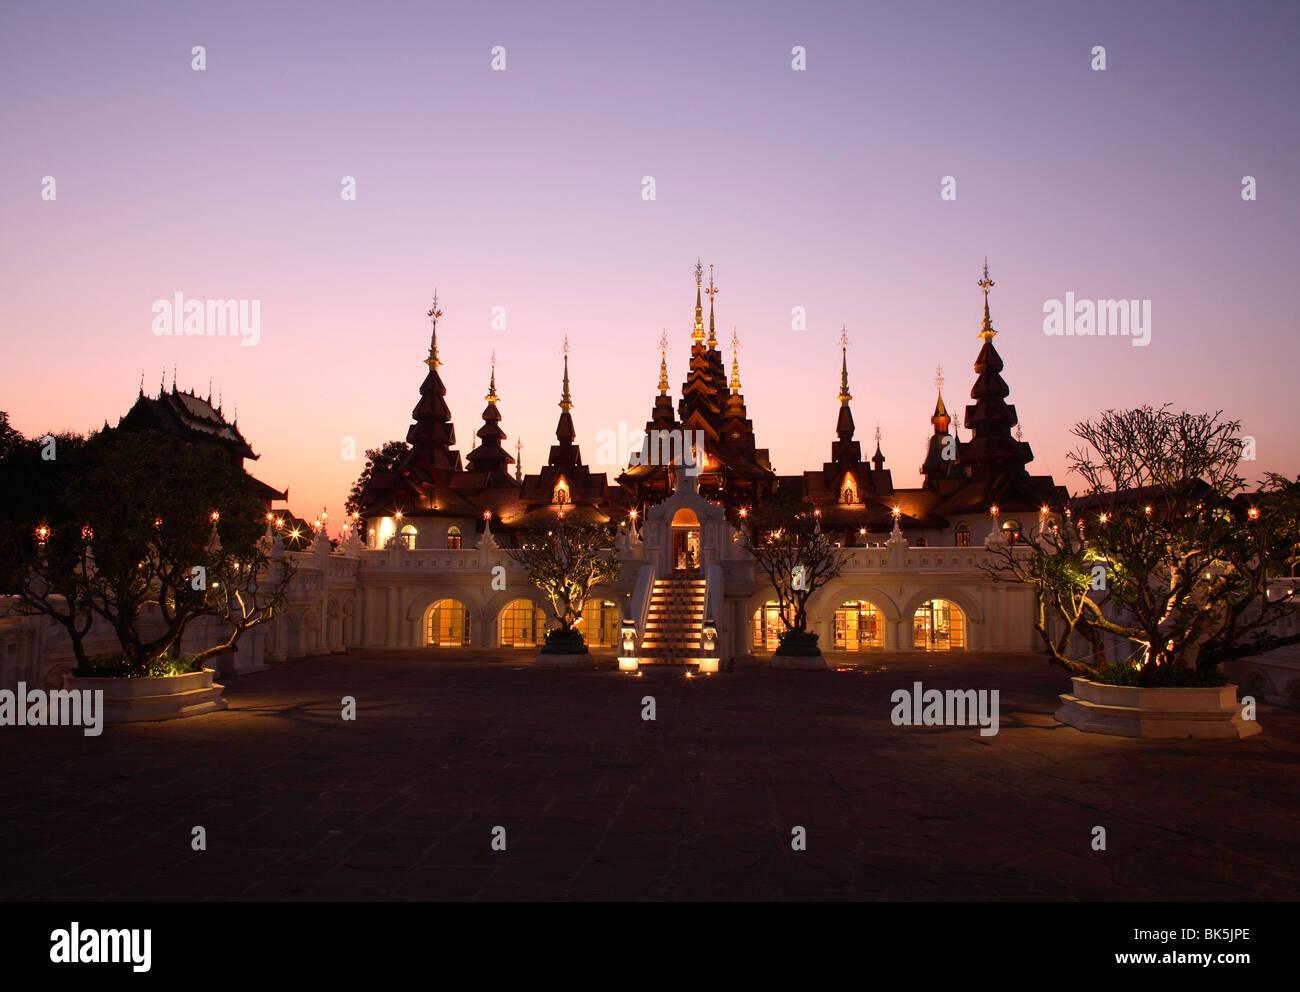 Lobby at the Mandarin Oriental Dhara Dhevi, Chiang Mai, Thailand, Southeast Asia, Asia - Stock Image